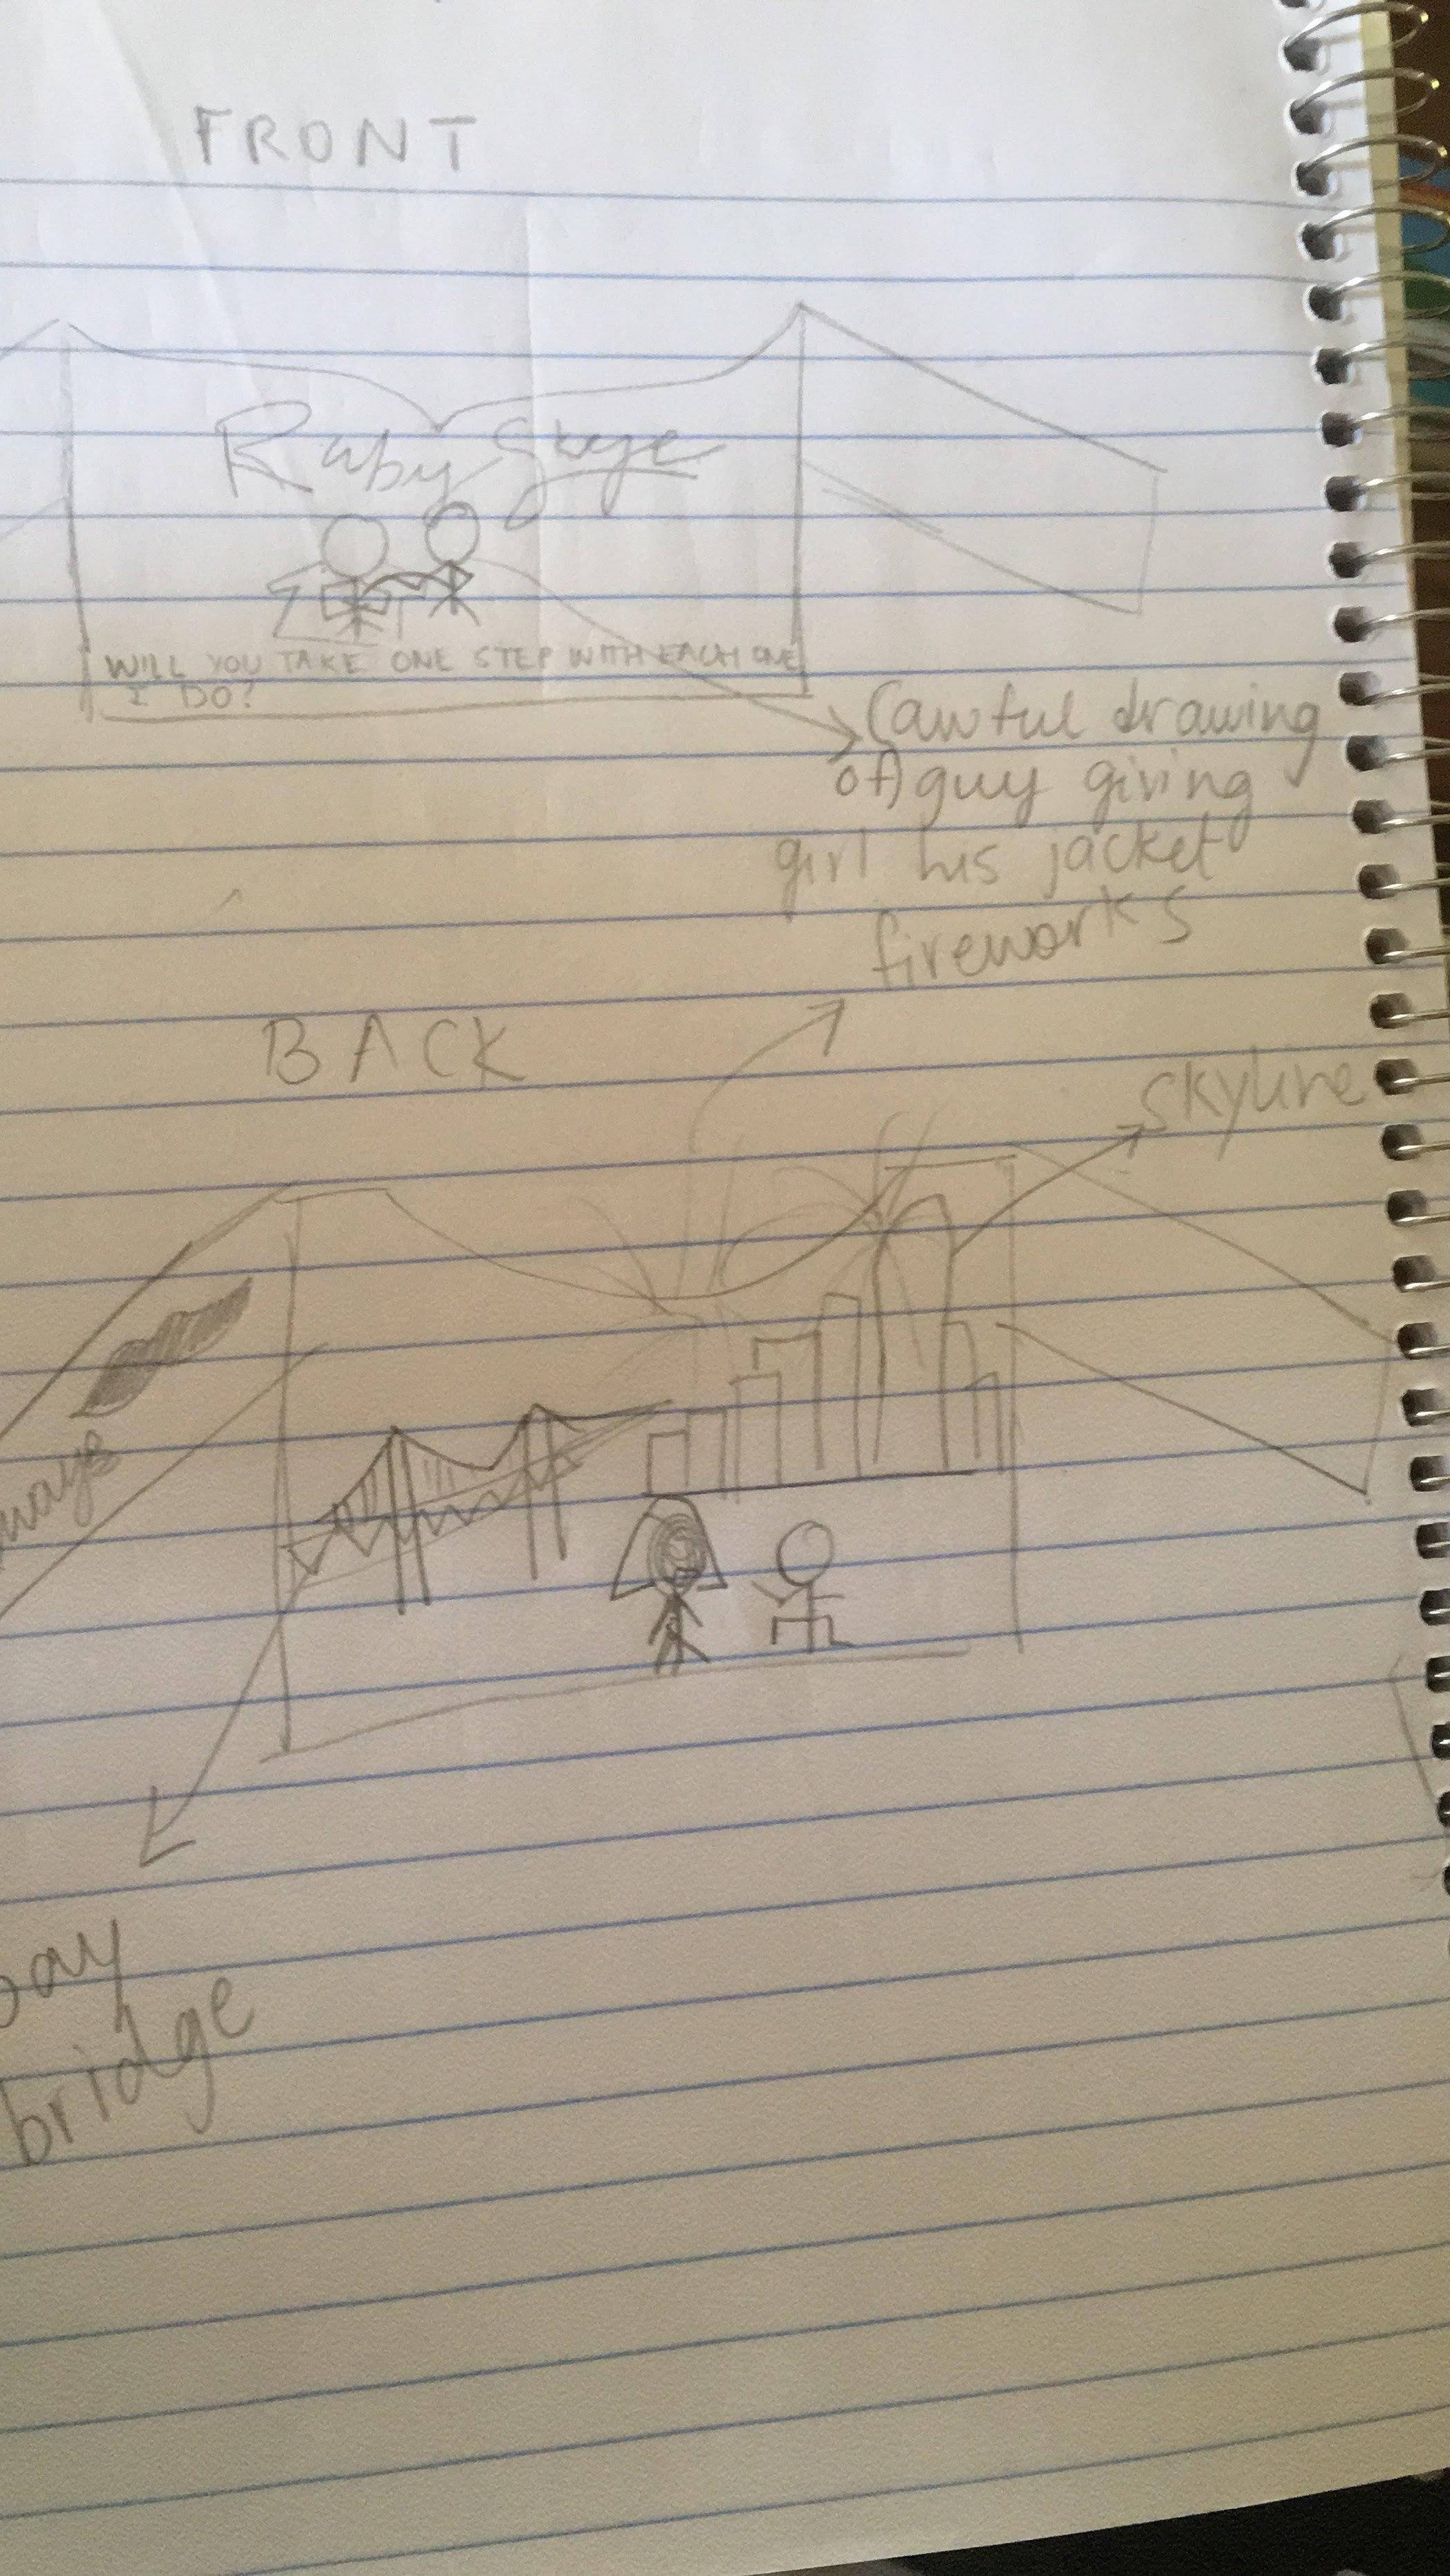 My Rough Sketch :P